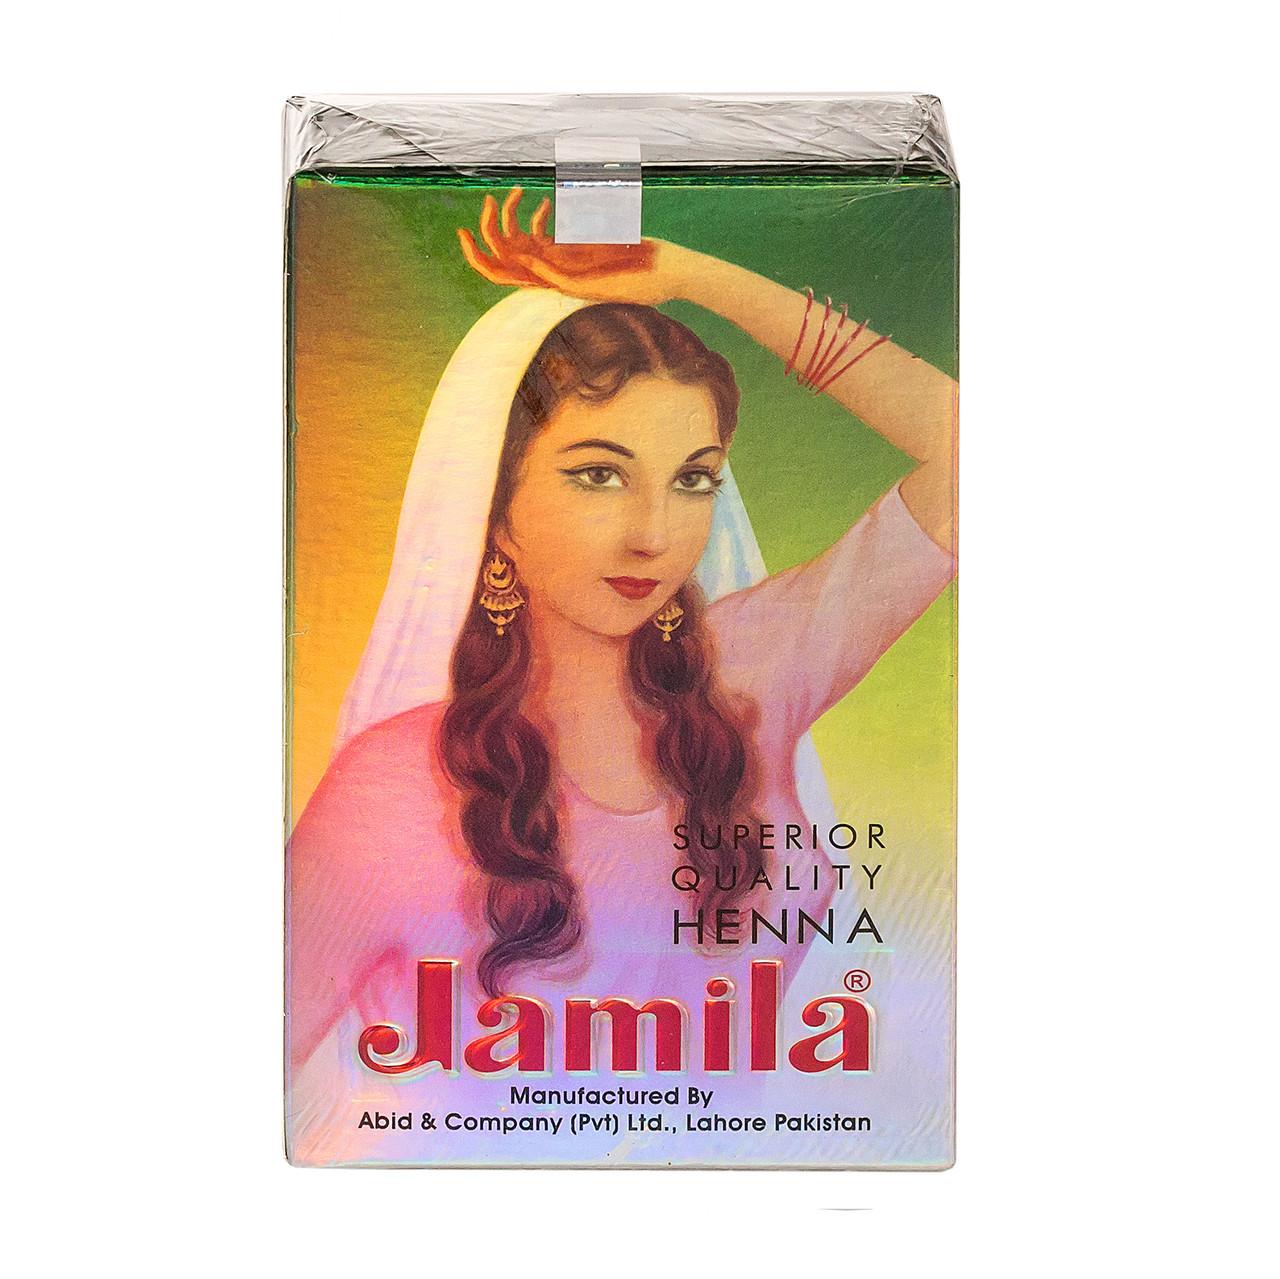 Jamila Henna Powder 2020 Crop 100g Body Art Quality Henna Artistic Adornment